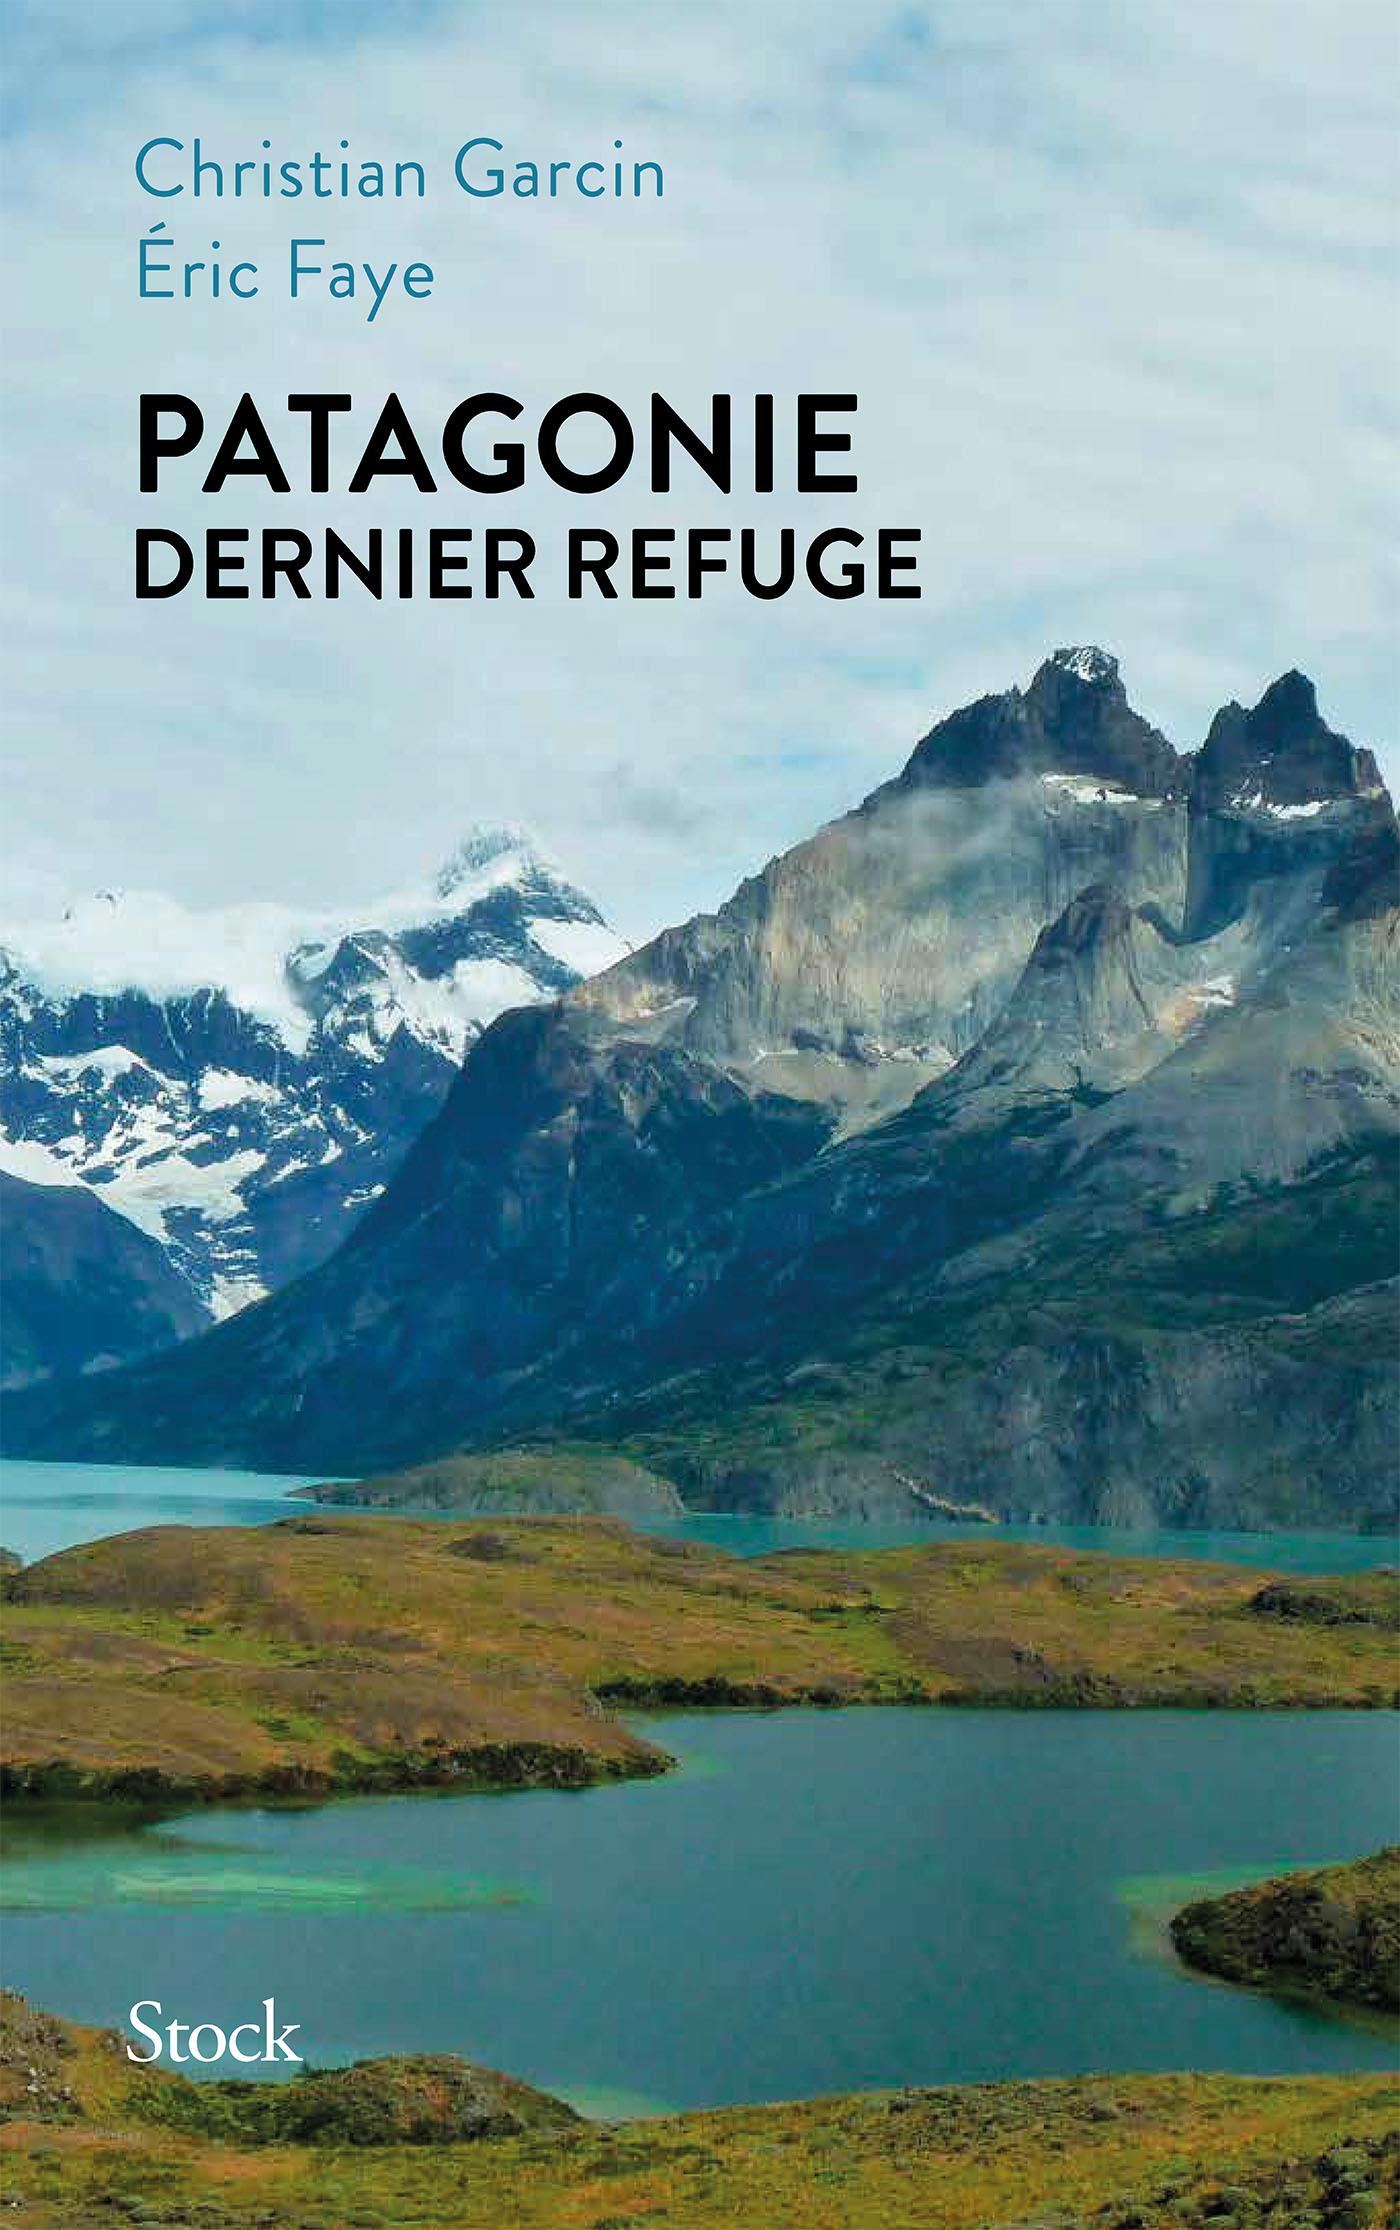 Patagonie dernier refuge | Faye, Eric. Auteur